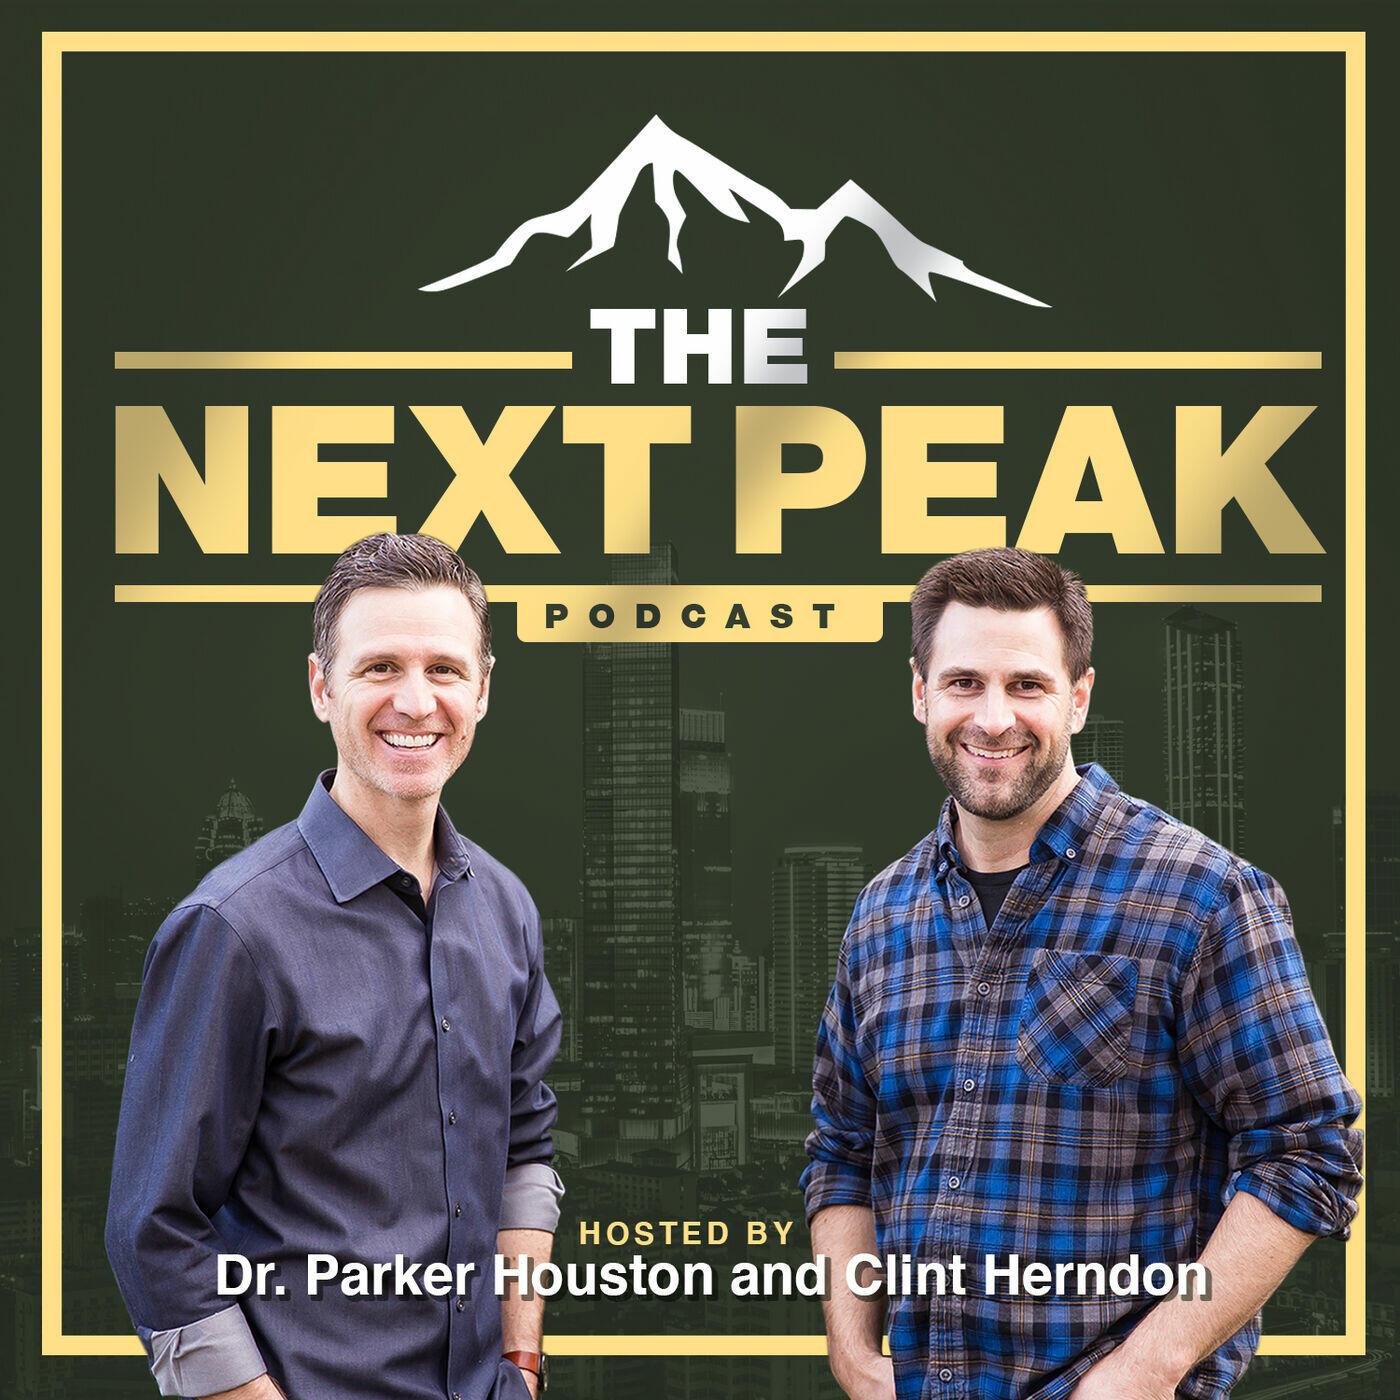 Next Peak Podcast